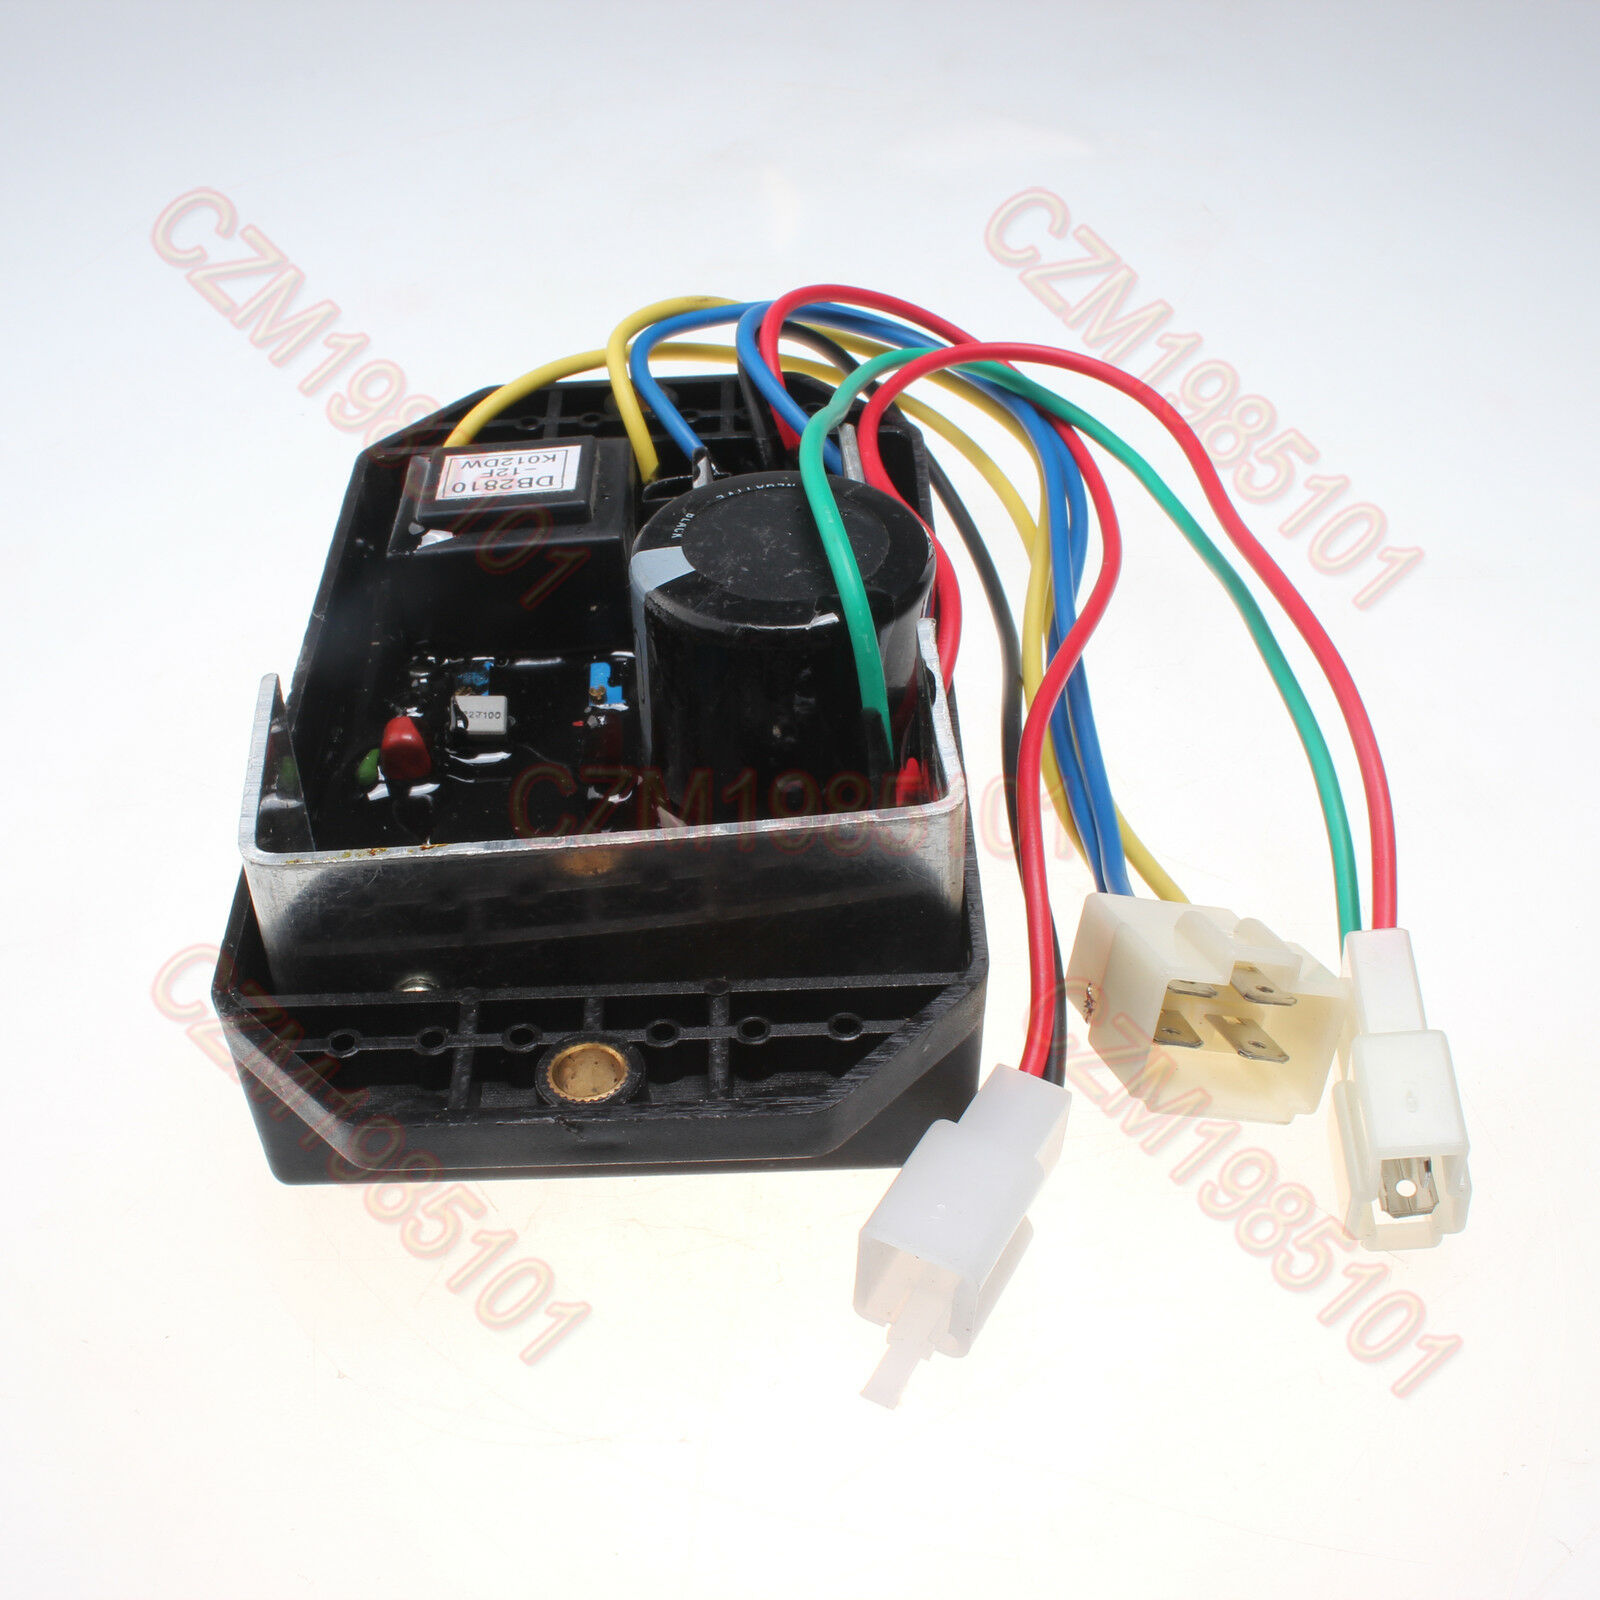 Details about Voltage Regulator 10KW AVR KI-DAVR-95S For KIPOR Single Phase  Diesel Generator